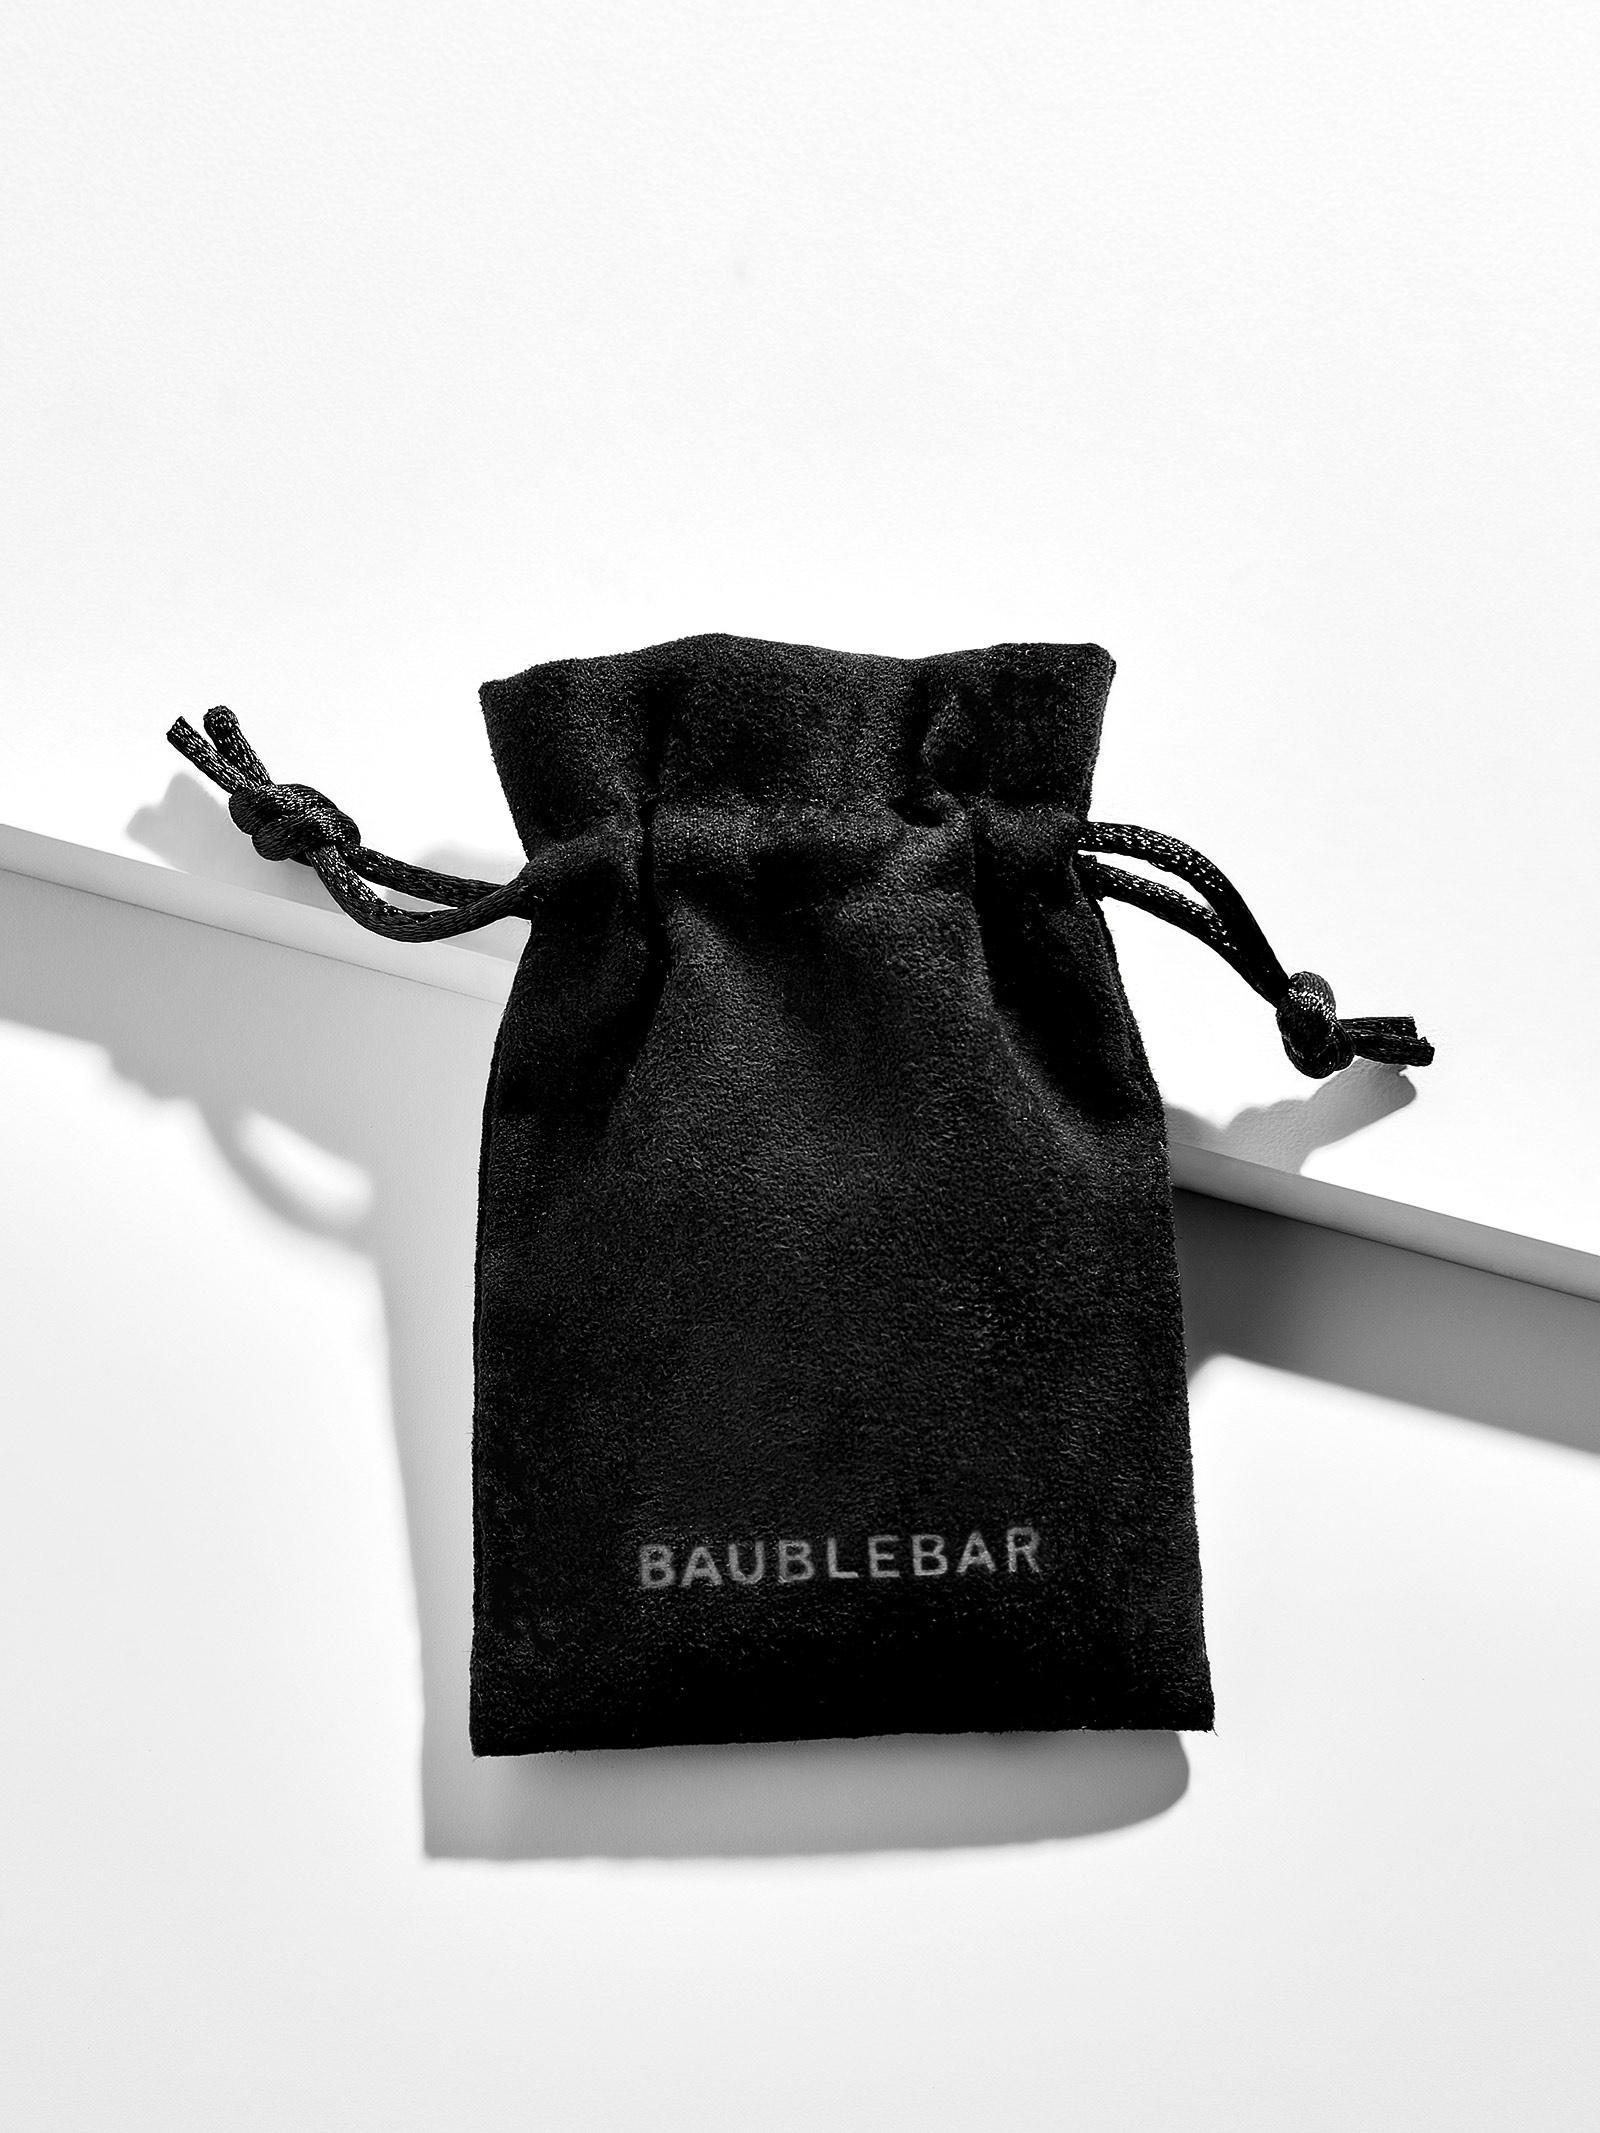 BaubleBar Fantasia 18k Gold Plated Earring Duo